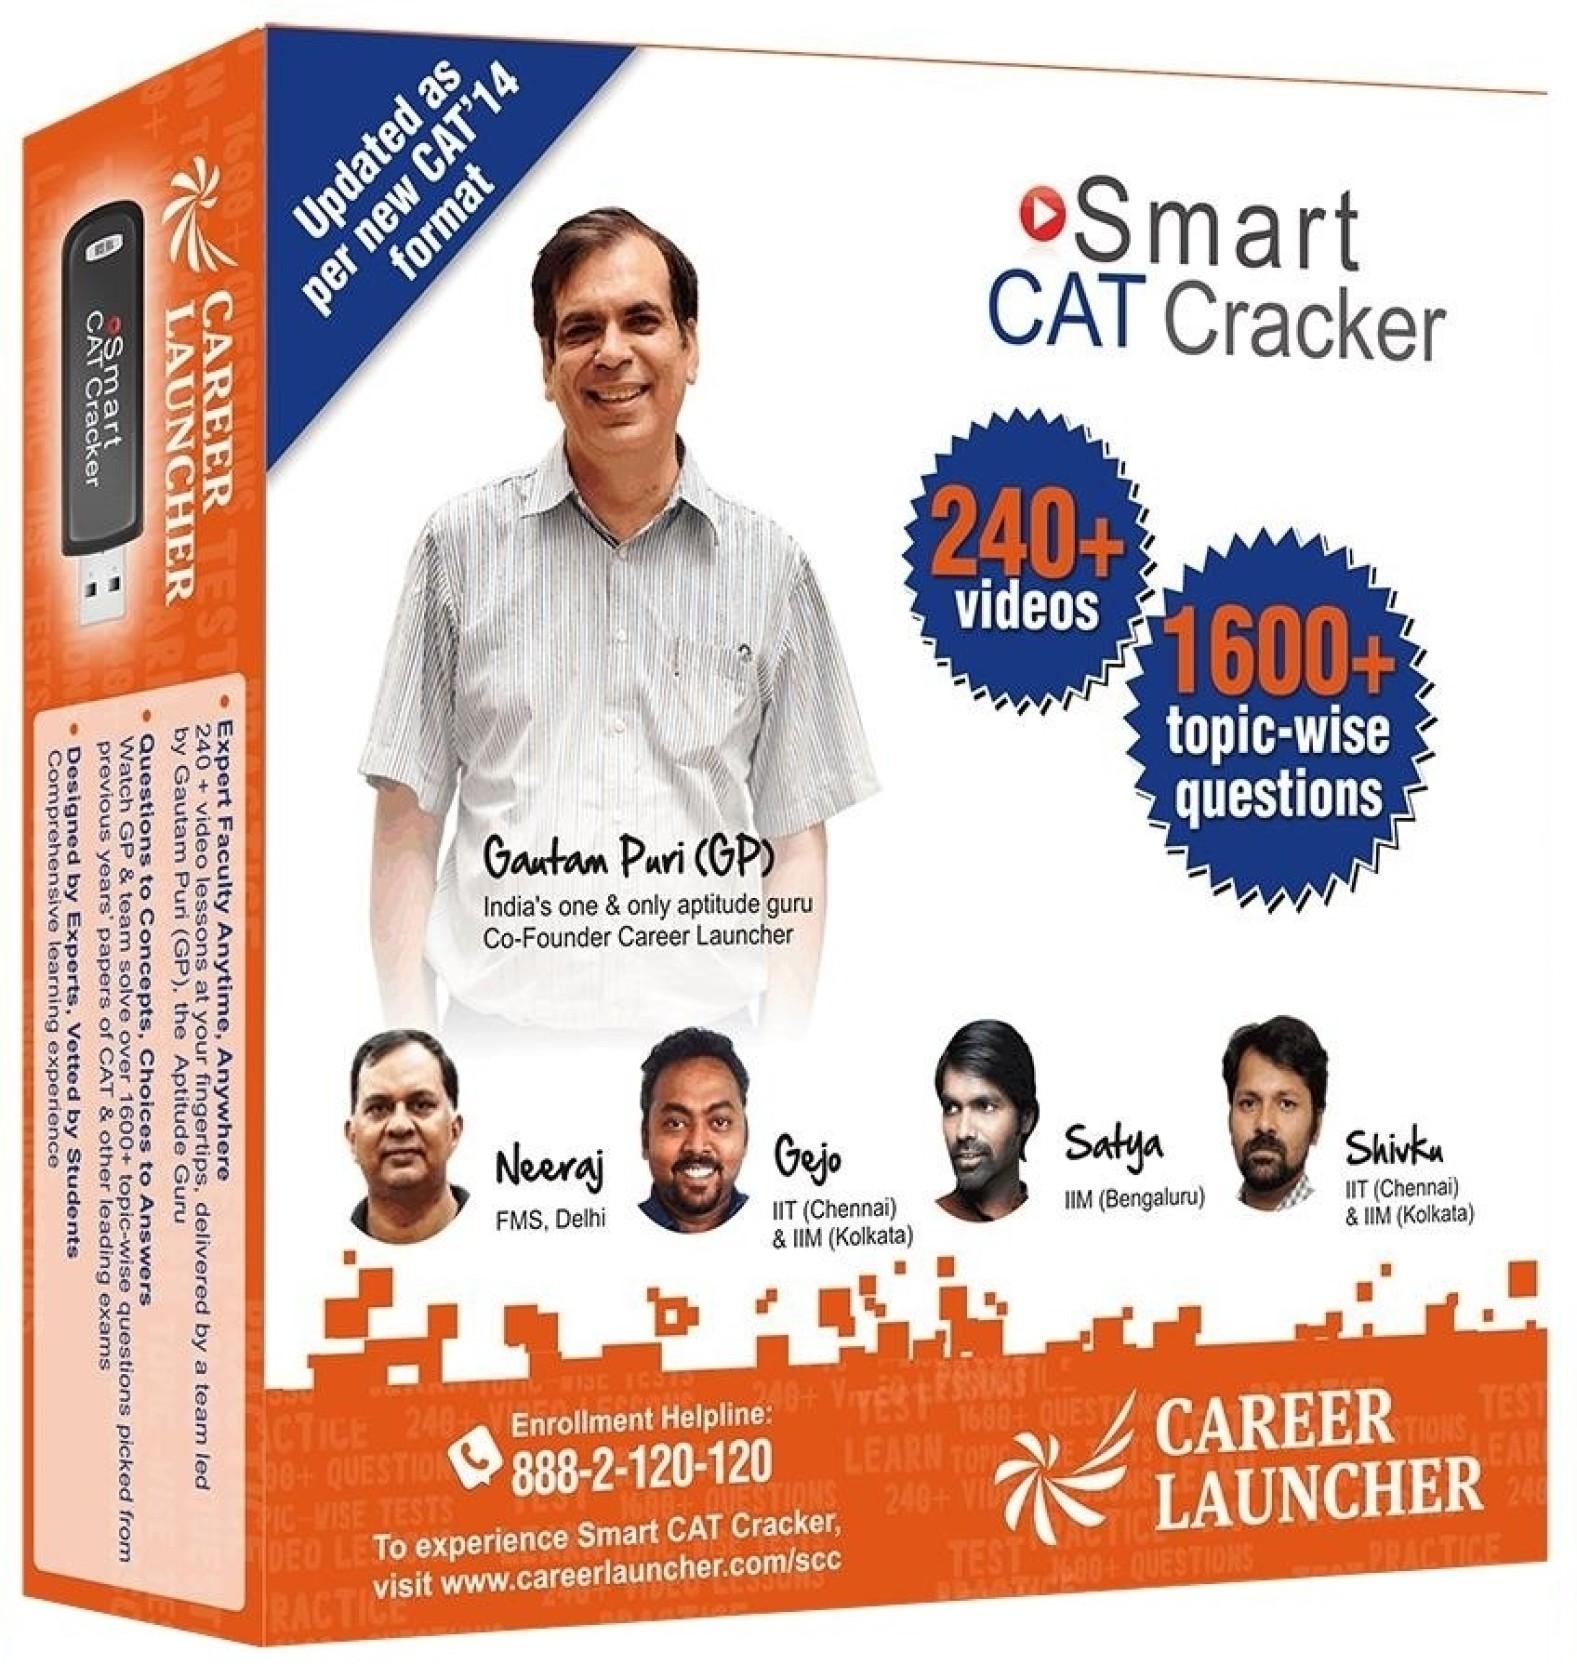 Career Launcher Smart CAT Cracker (OnMobile - USB) - Career Launcher